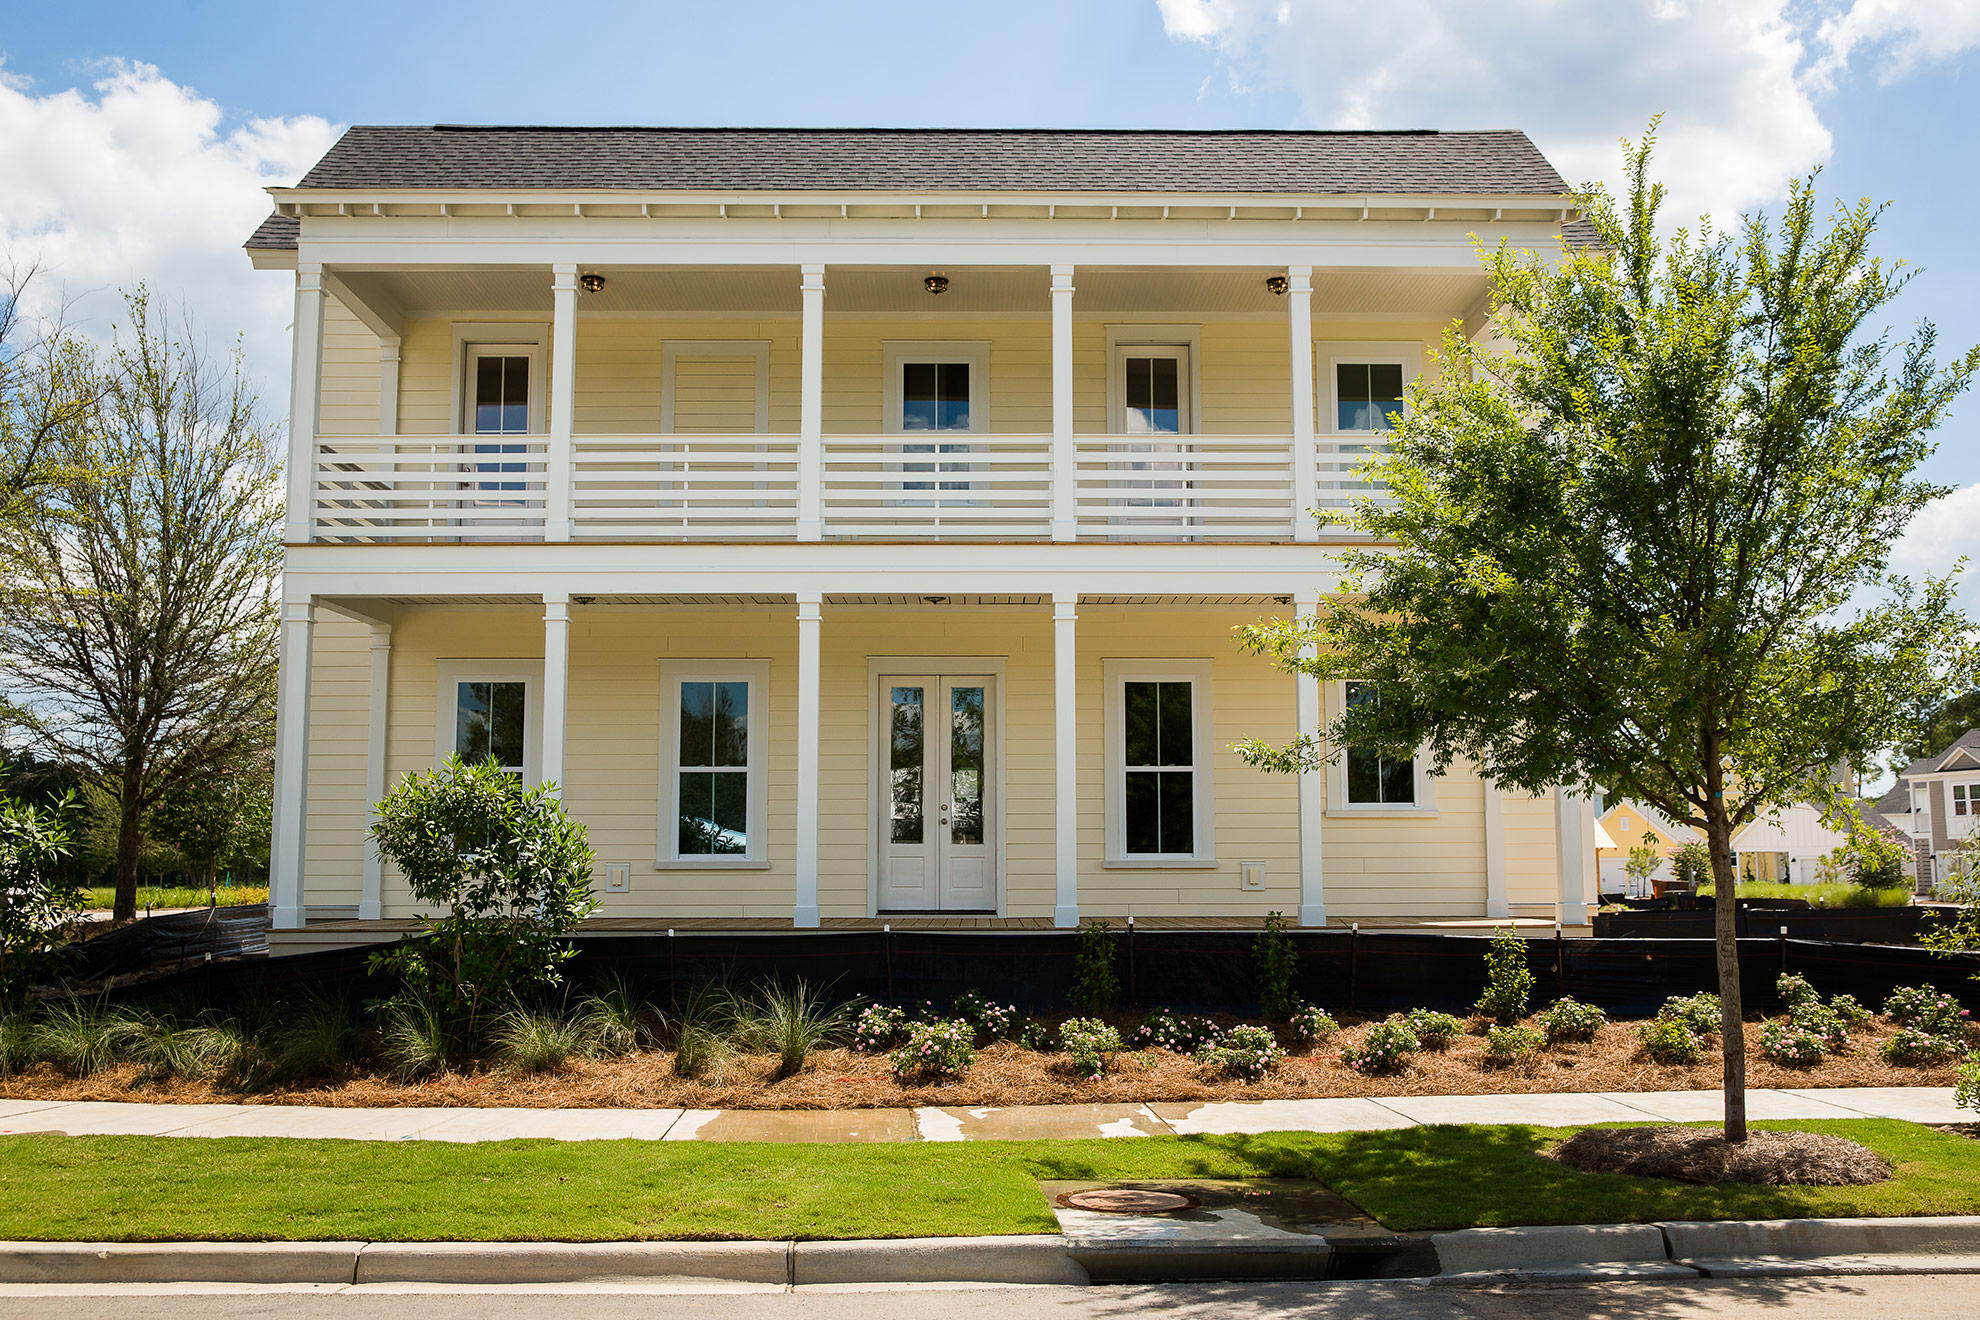 228 Summers Dr Summerville SC Estimate and Home Details